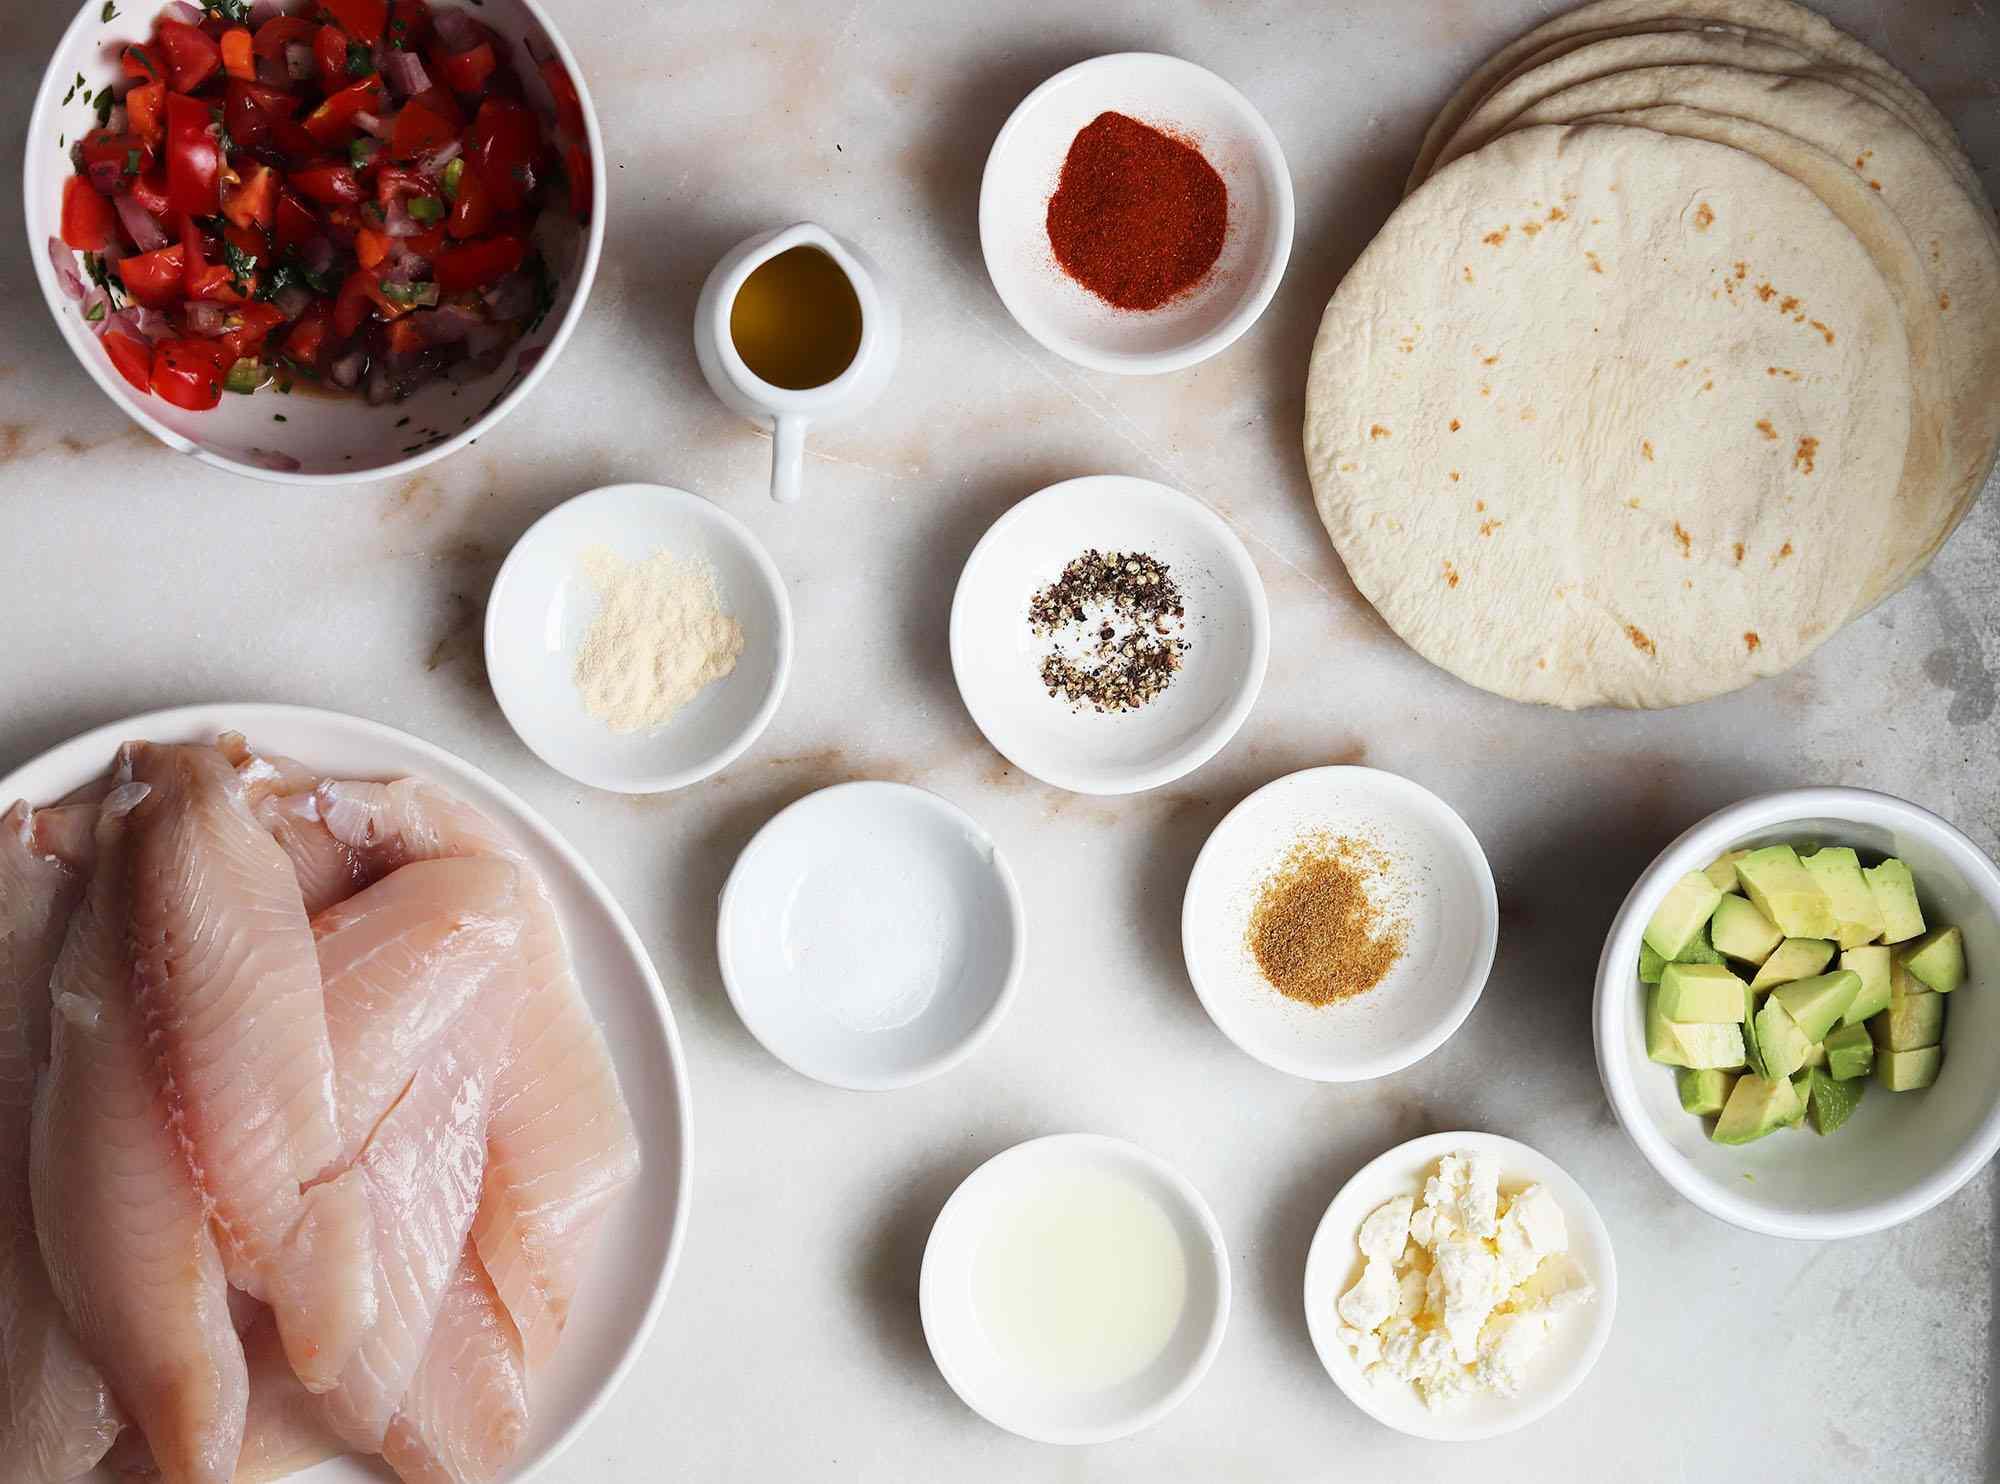 tilapia fish taco ingredients